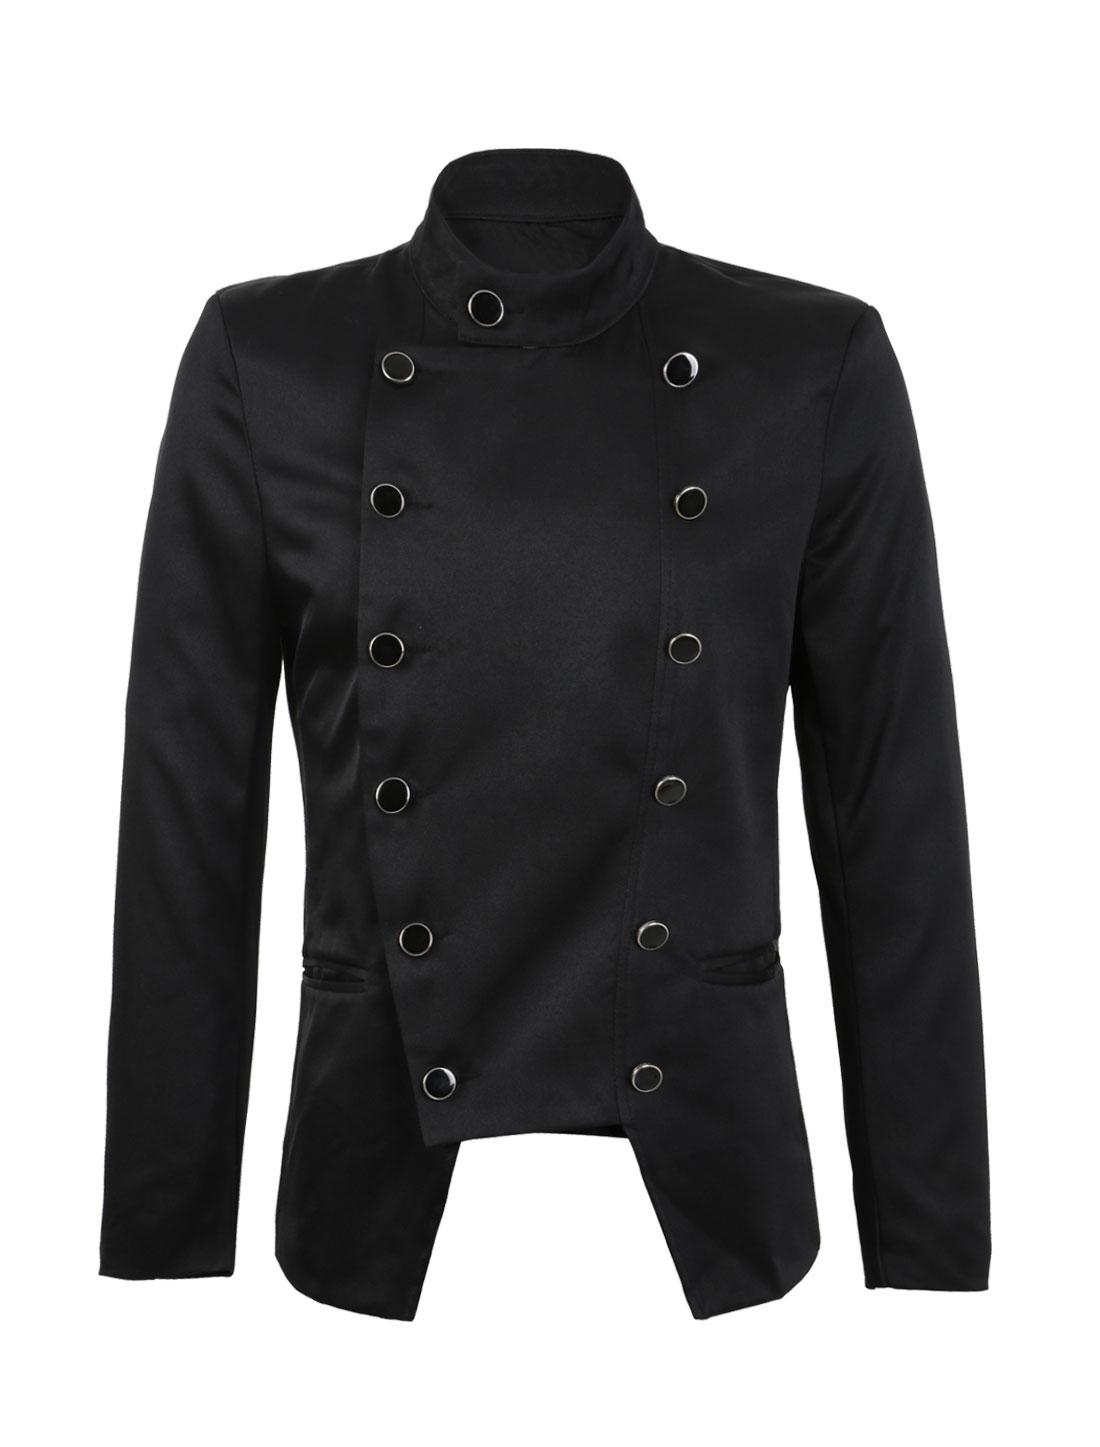 Men Slim Fit Casual Pockets Irregular Double Breasted Suit Jacket Blazer Black L